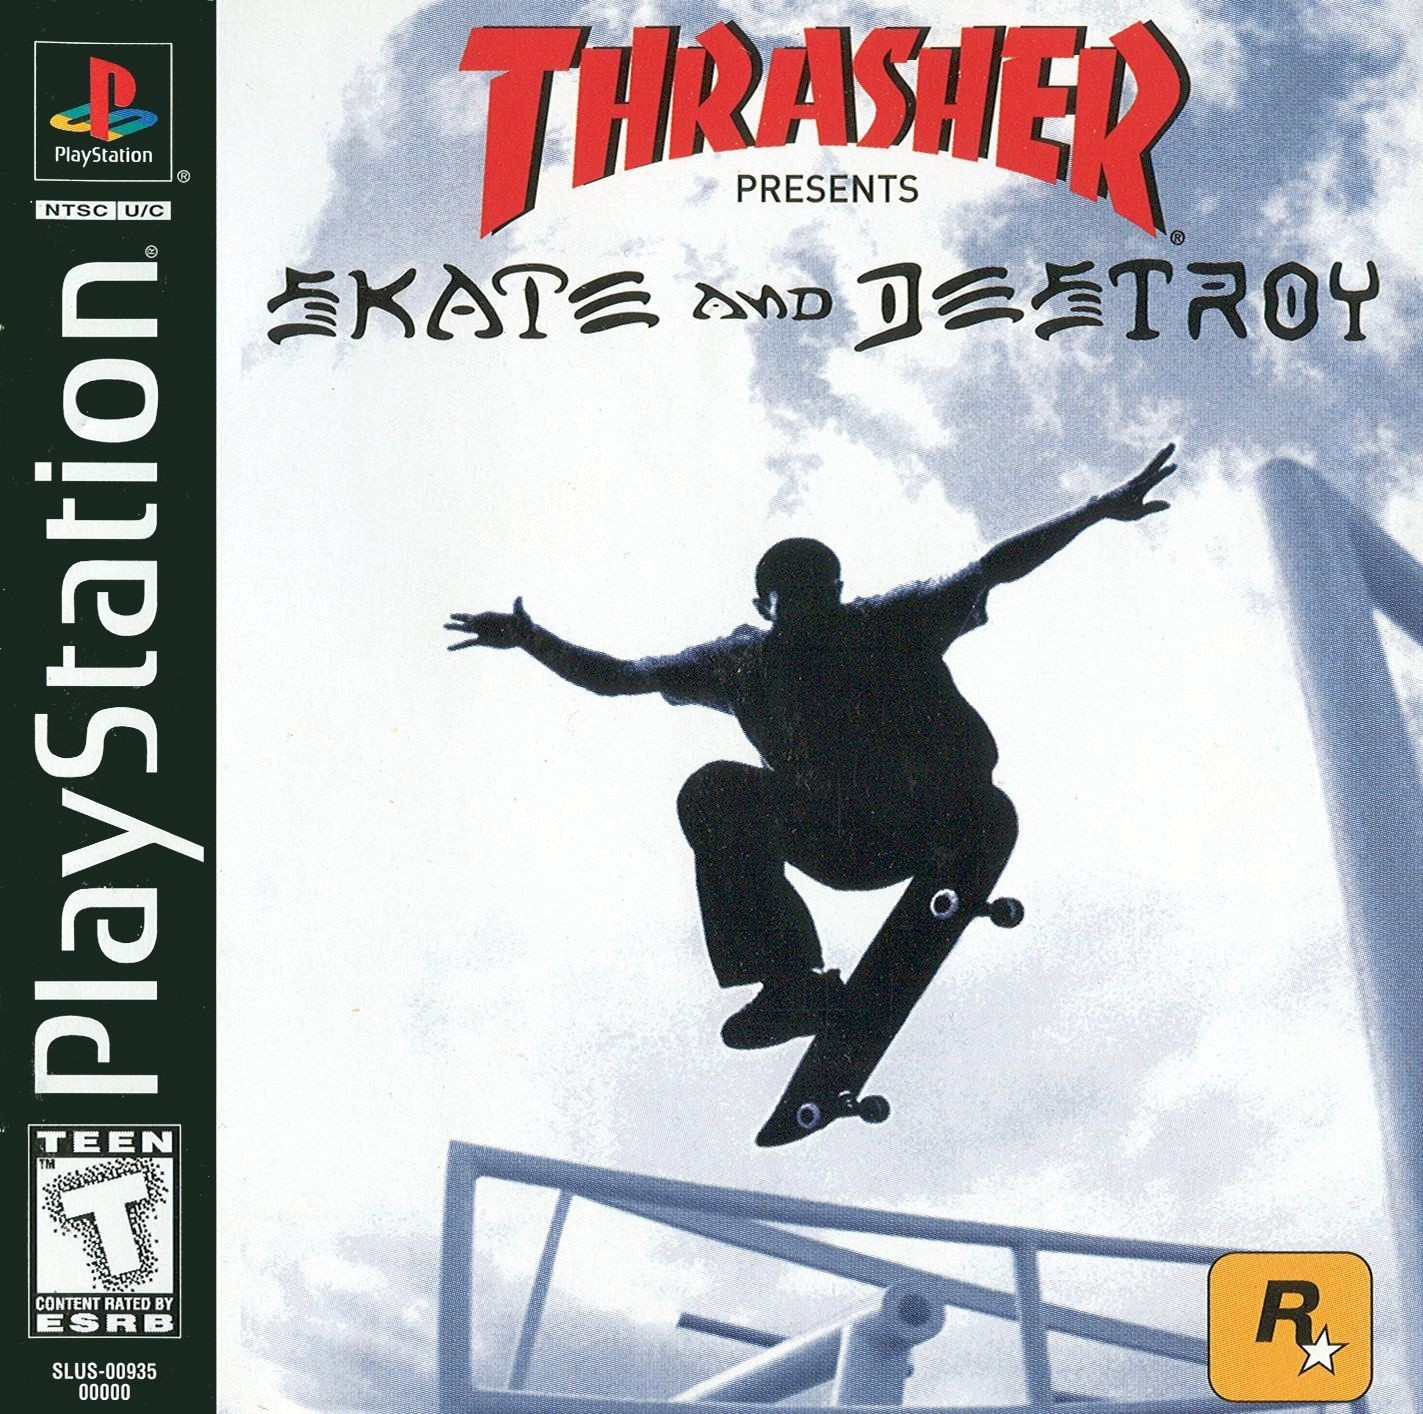 Thrasher Presents Skate And Destroy